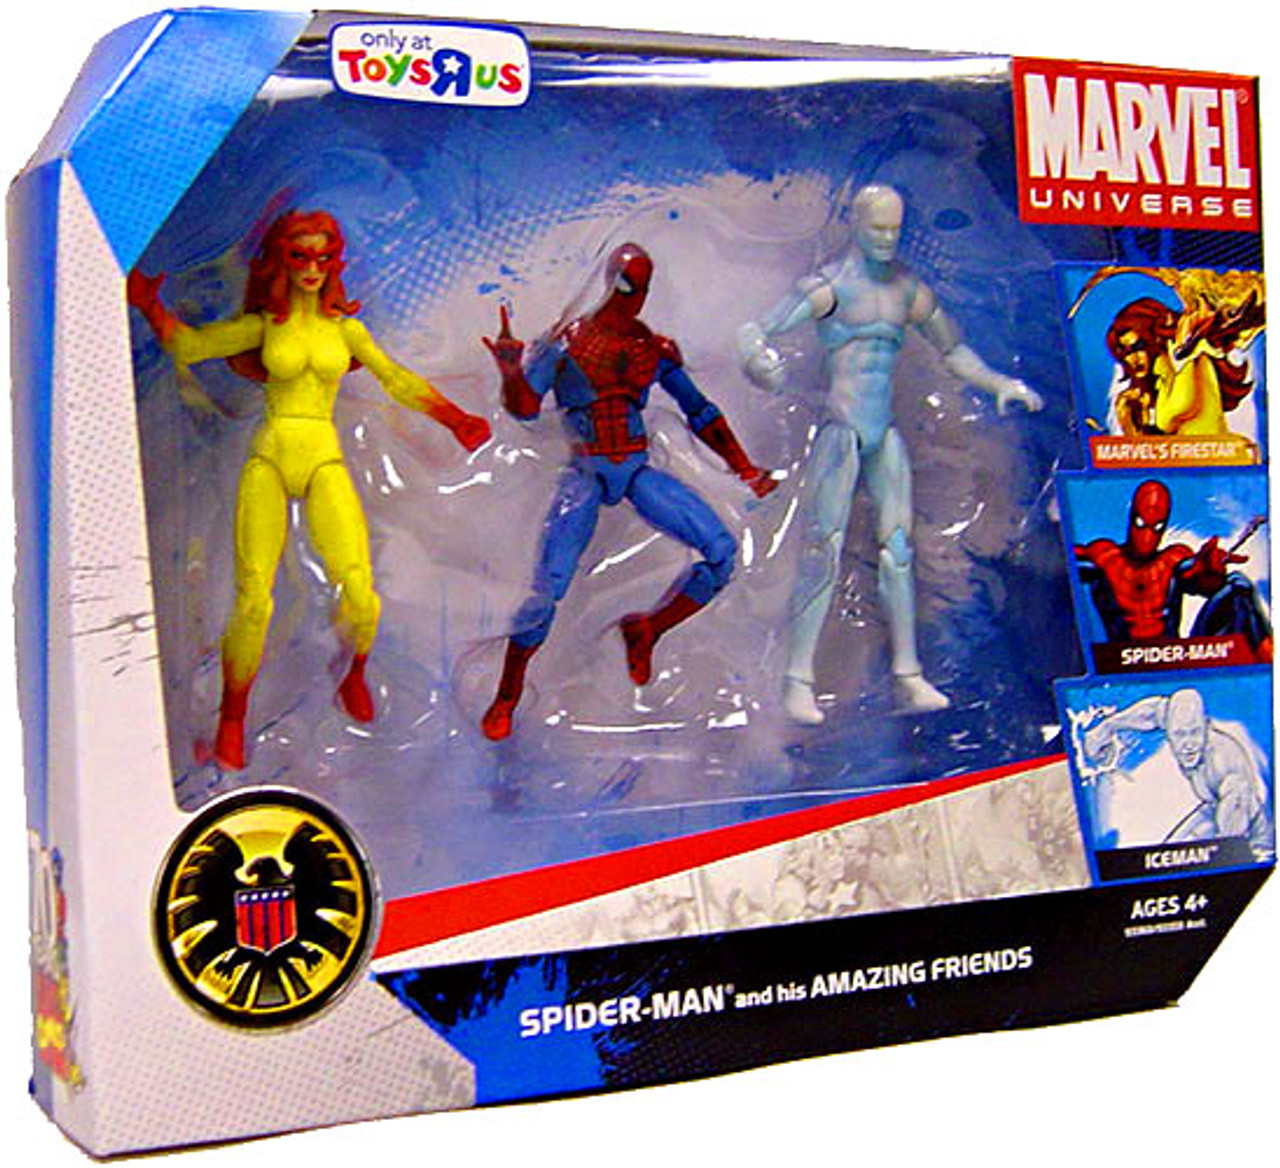 Marvel Universe Exclusives Spider-Man & His Amazing Friends Exclusive Action Figure Set